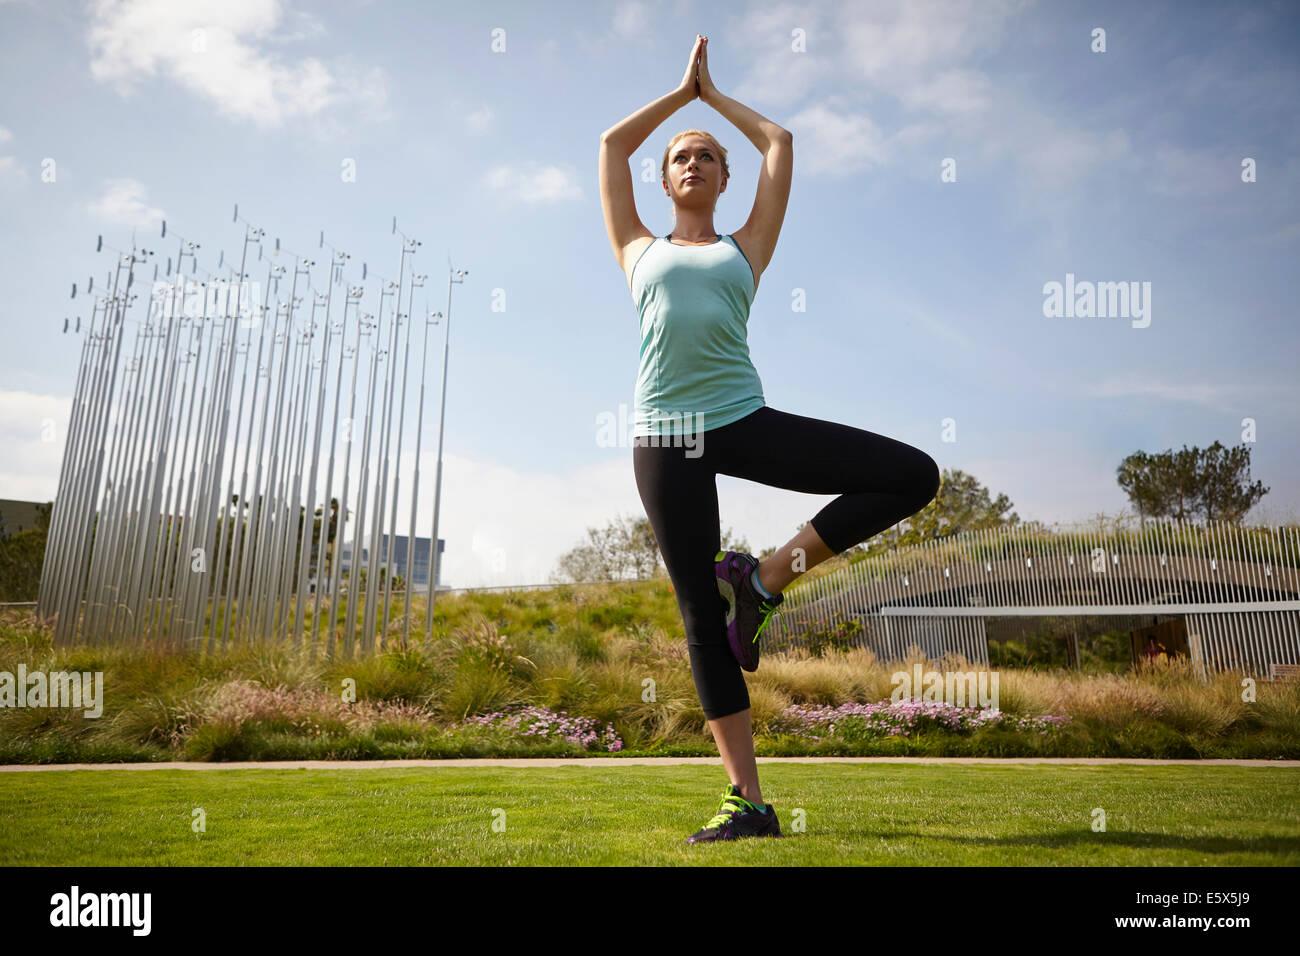 Woman practising yoga in park - Stock Image